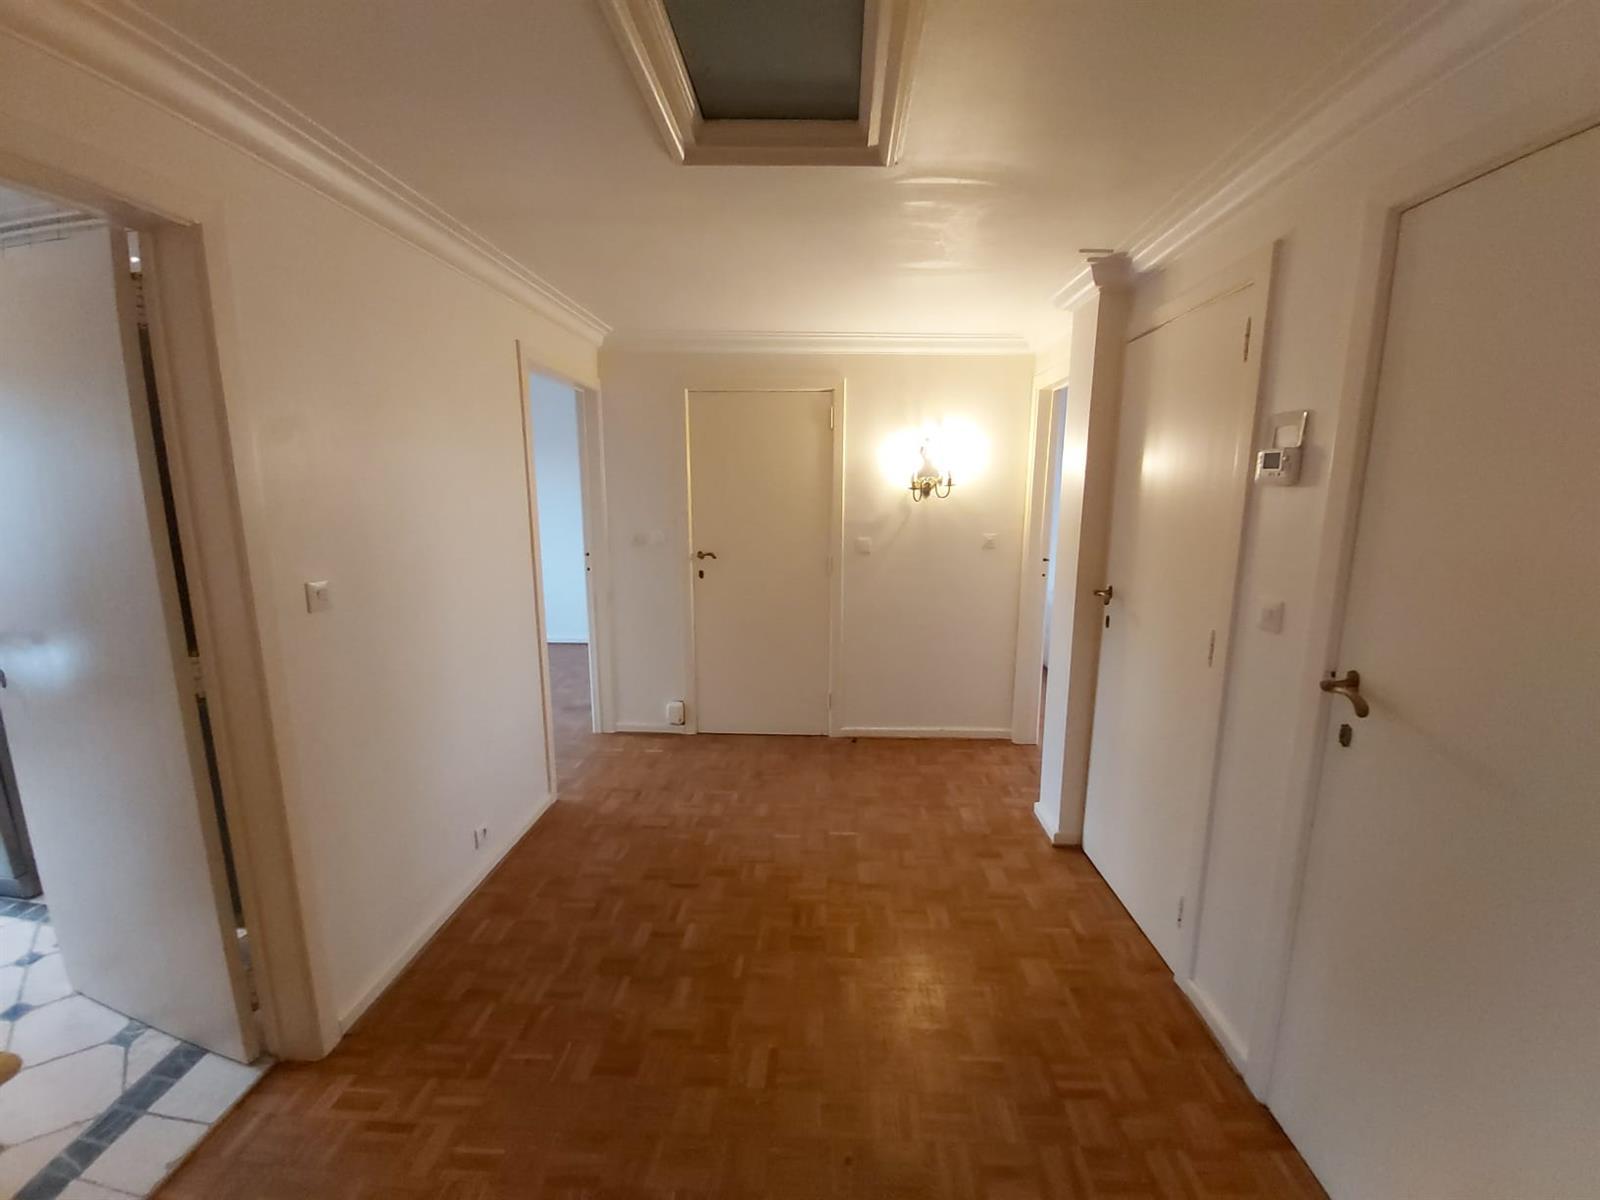 Appartement - Woluwe-Saint-Lambert - #4174735-8